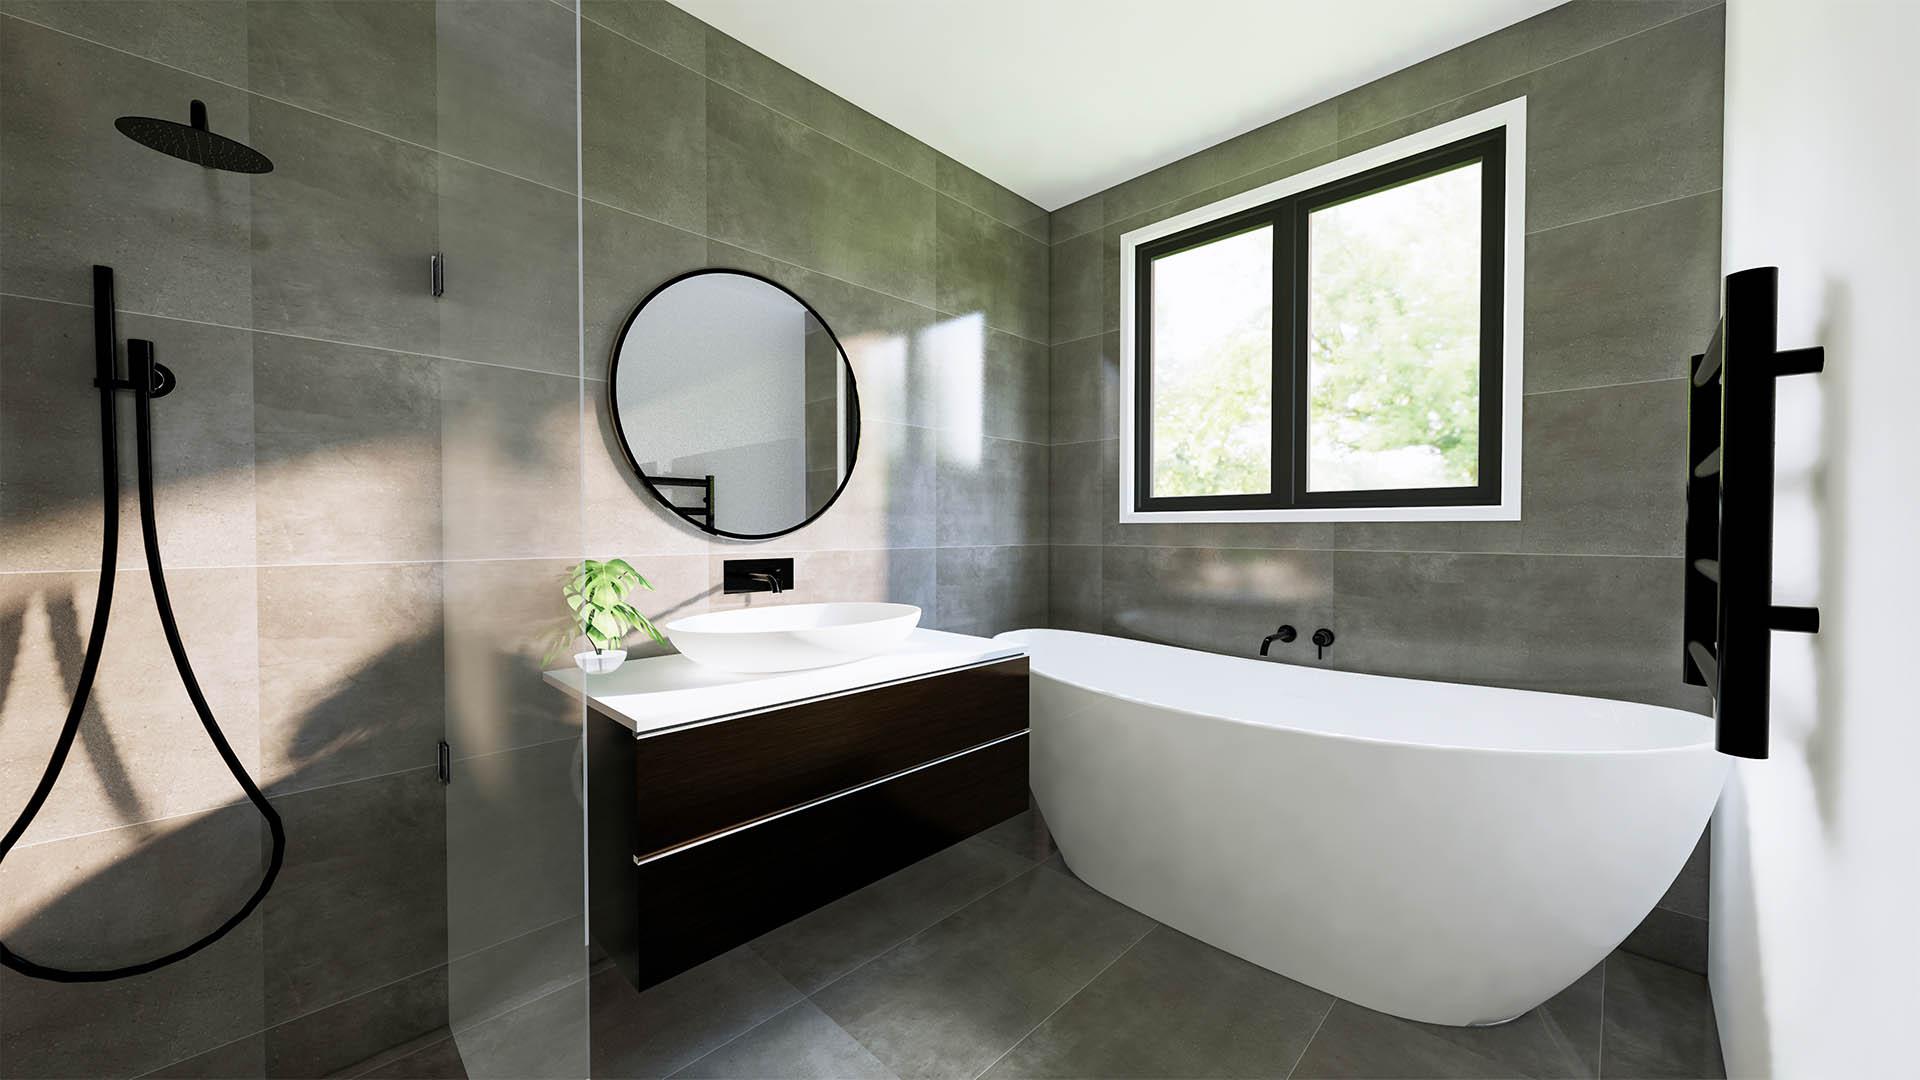 SouthIsland Bathroom